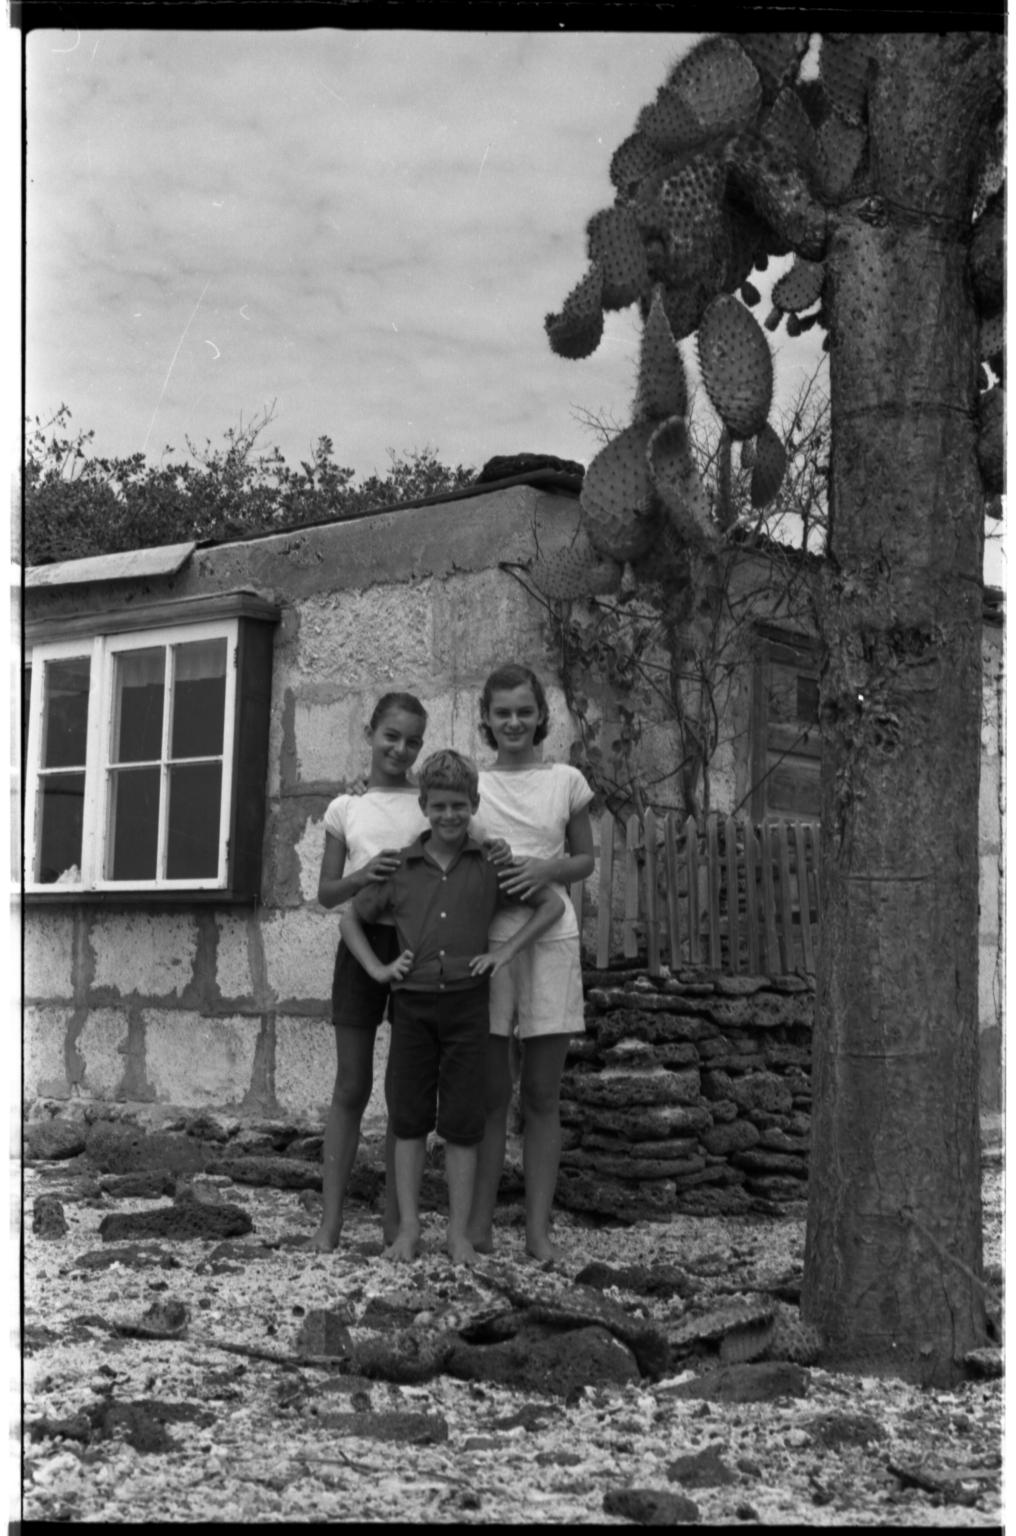 Children in Galapagos Islands.